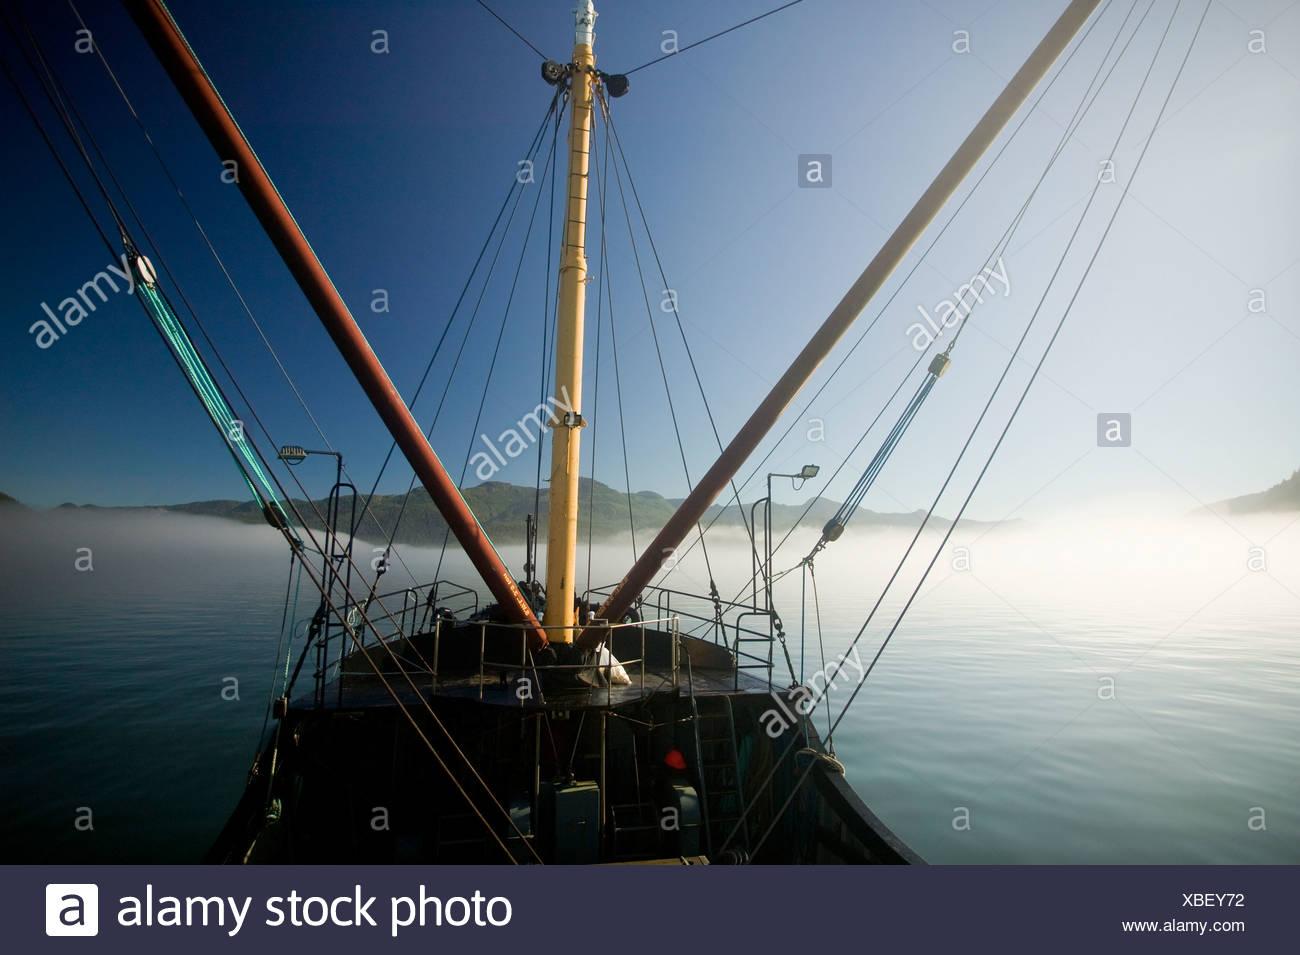 MV Uchuck III, supply vessel,, Western Vancouver Island, Vancouver Island, British Columbia, Canada - Stock Image